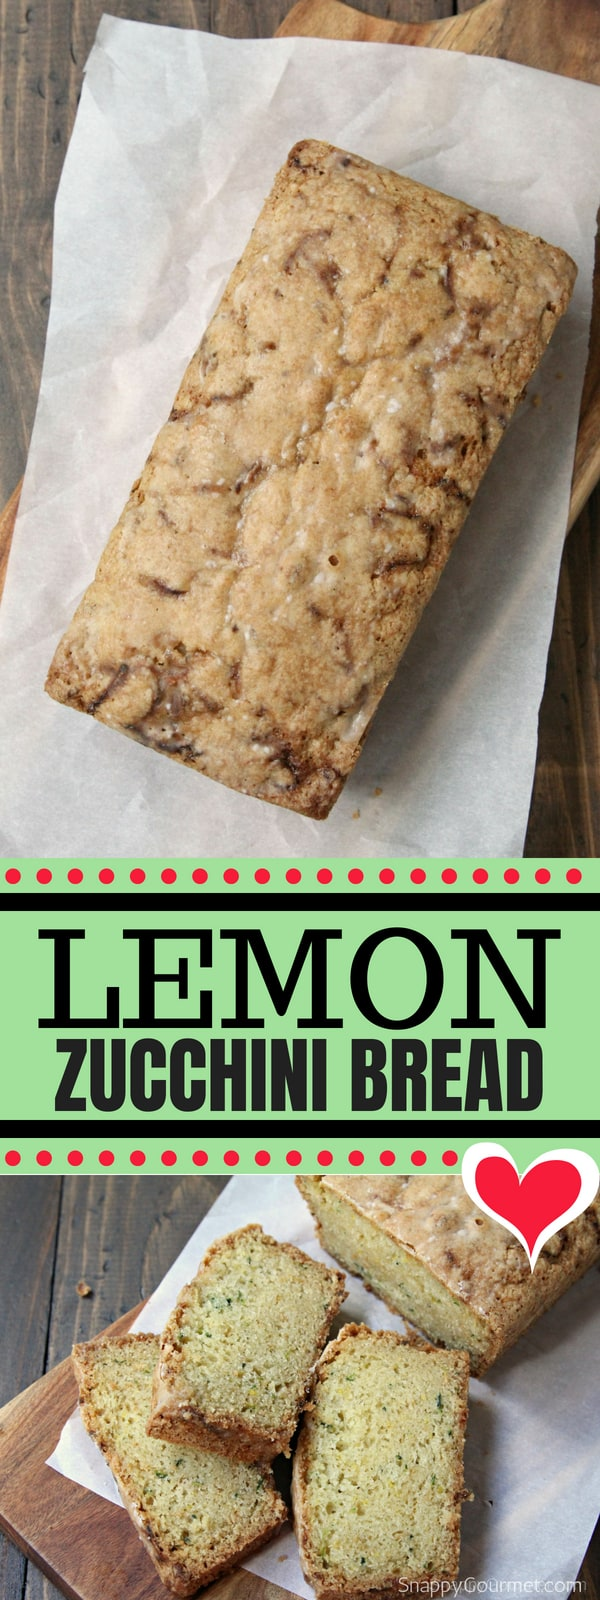 Lemon Zucchini Bread - easy zucchini bread with with fresh lemon and a lemon glaze